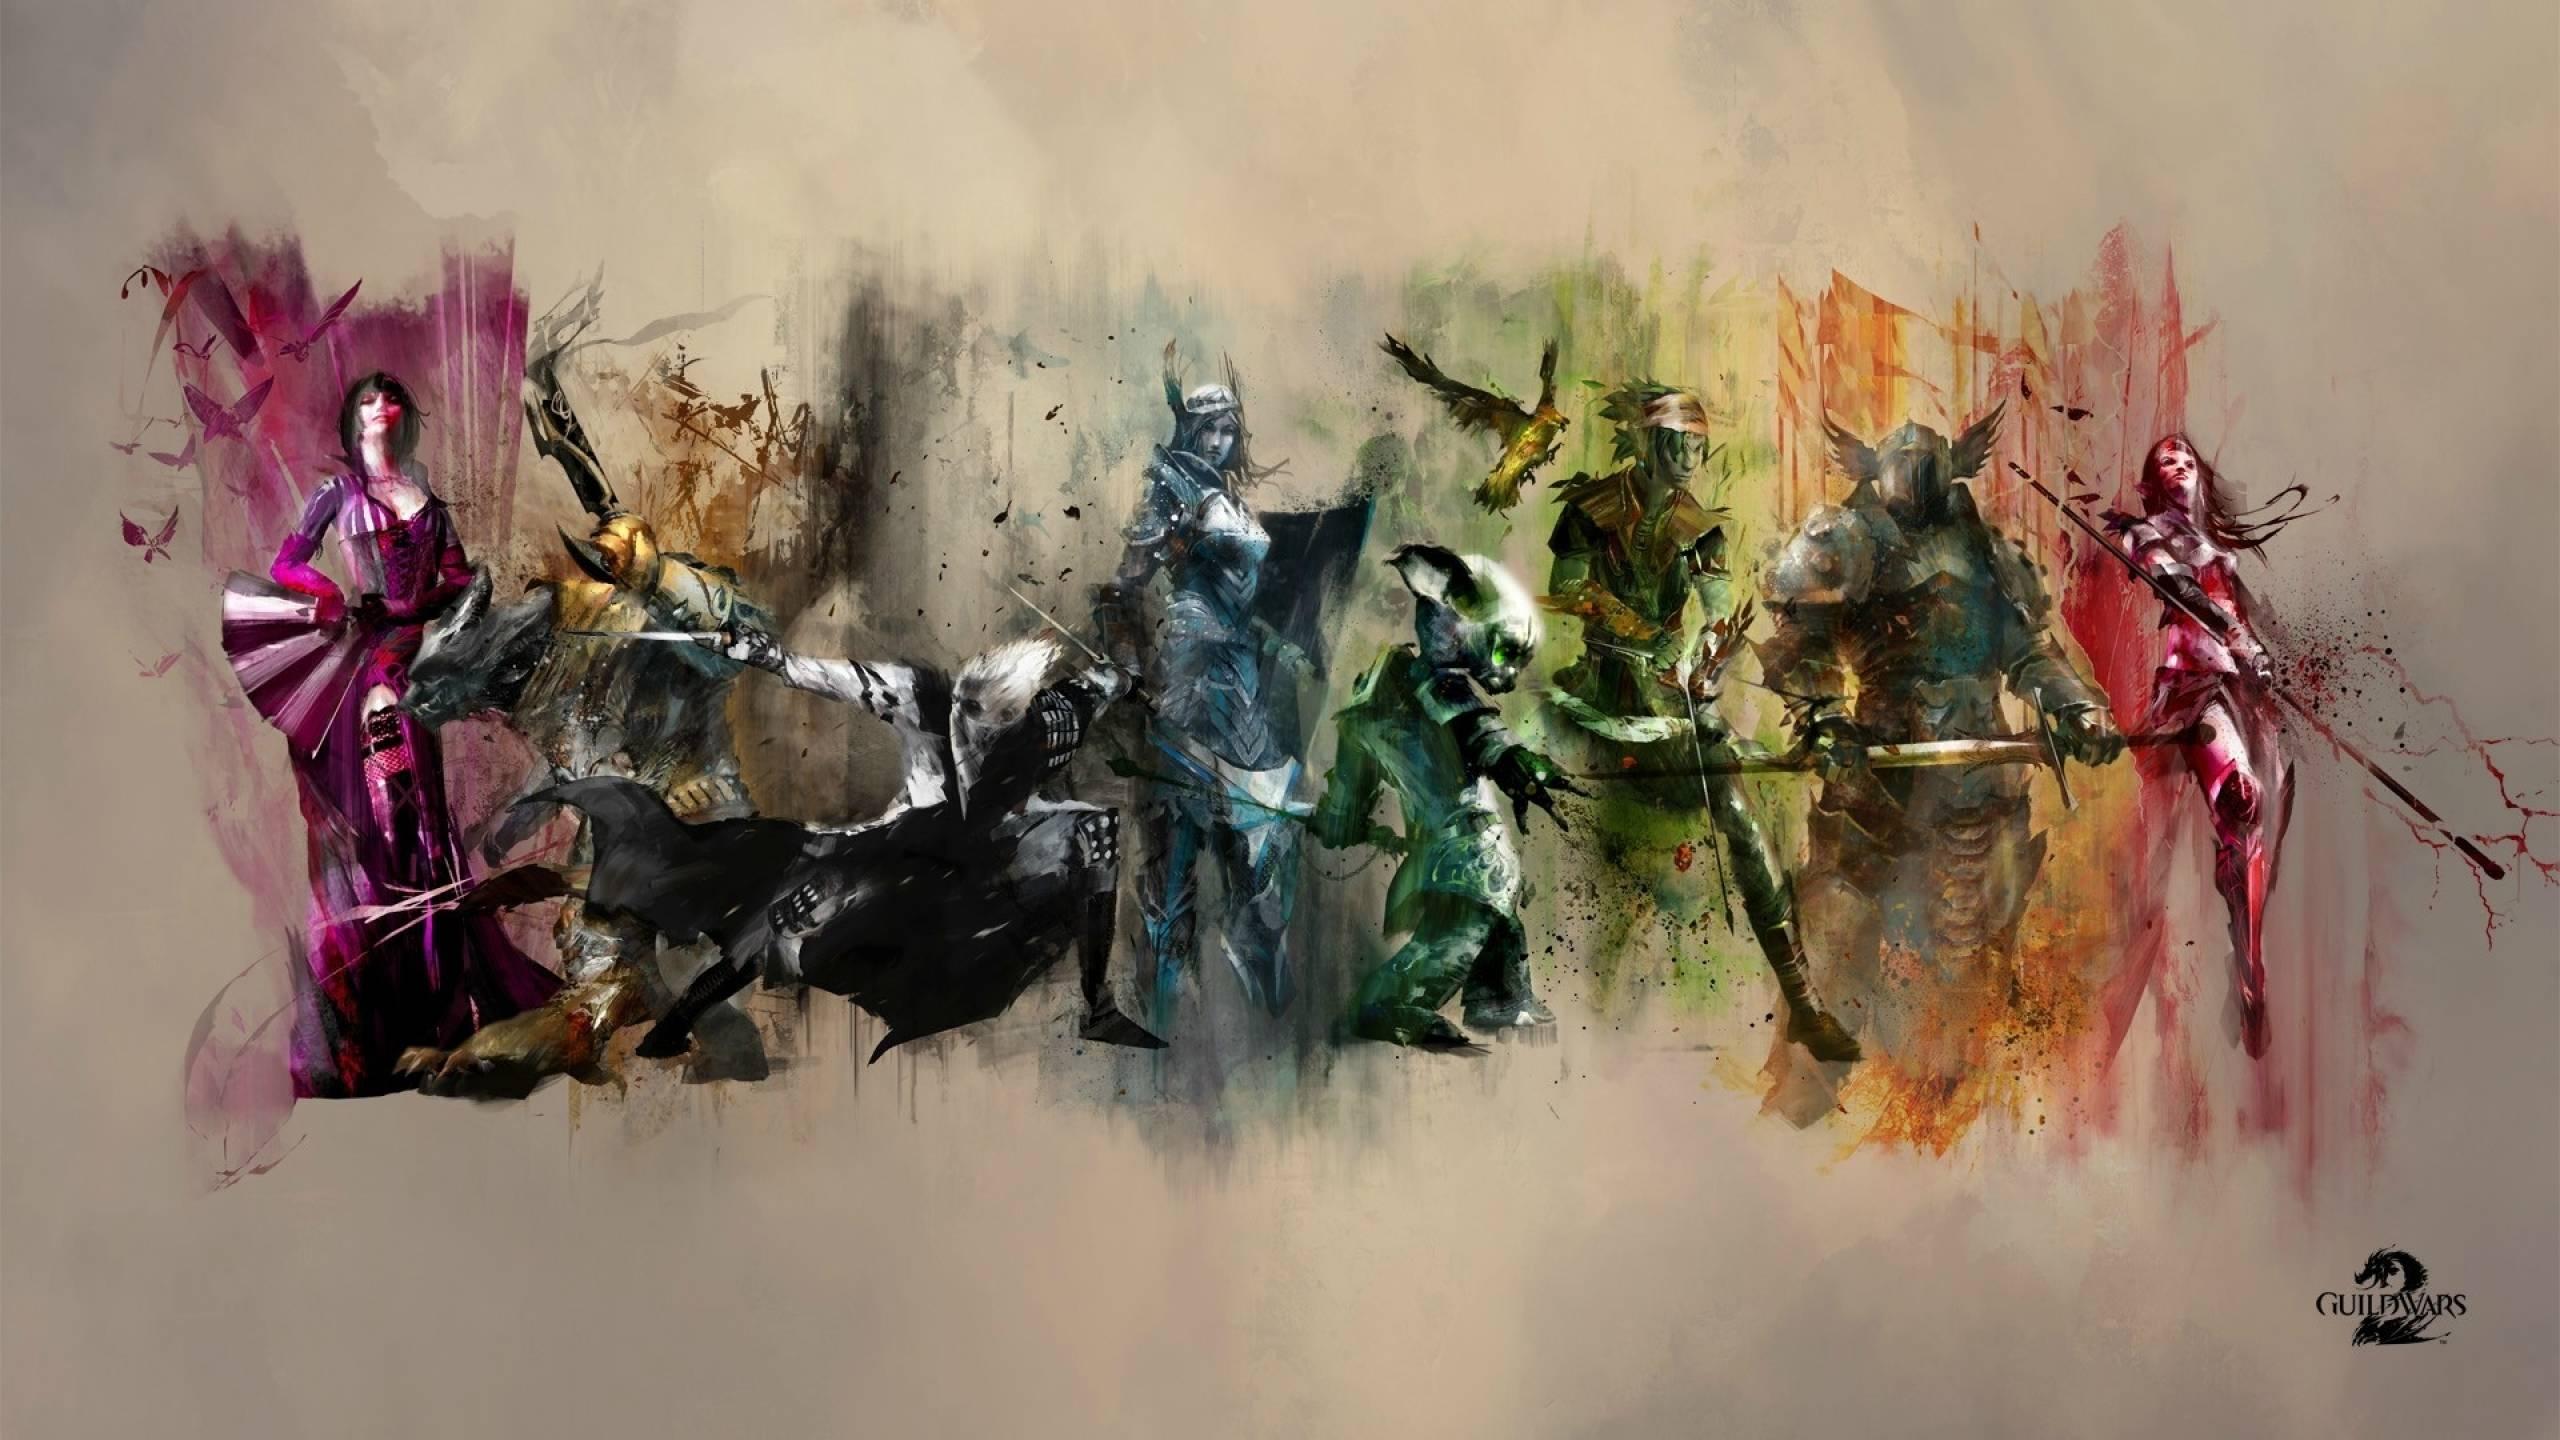 HD Guild Wars 2 Wallpapers   Wallpaper Cave